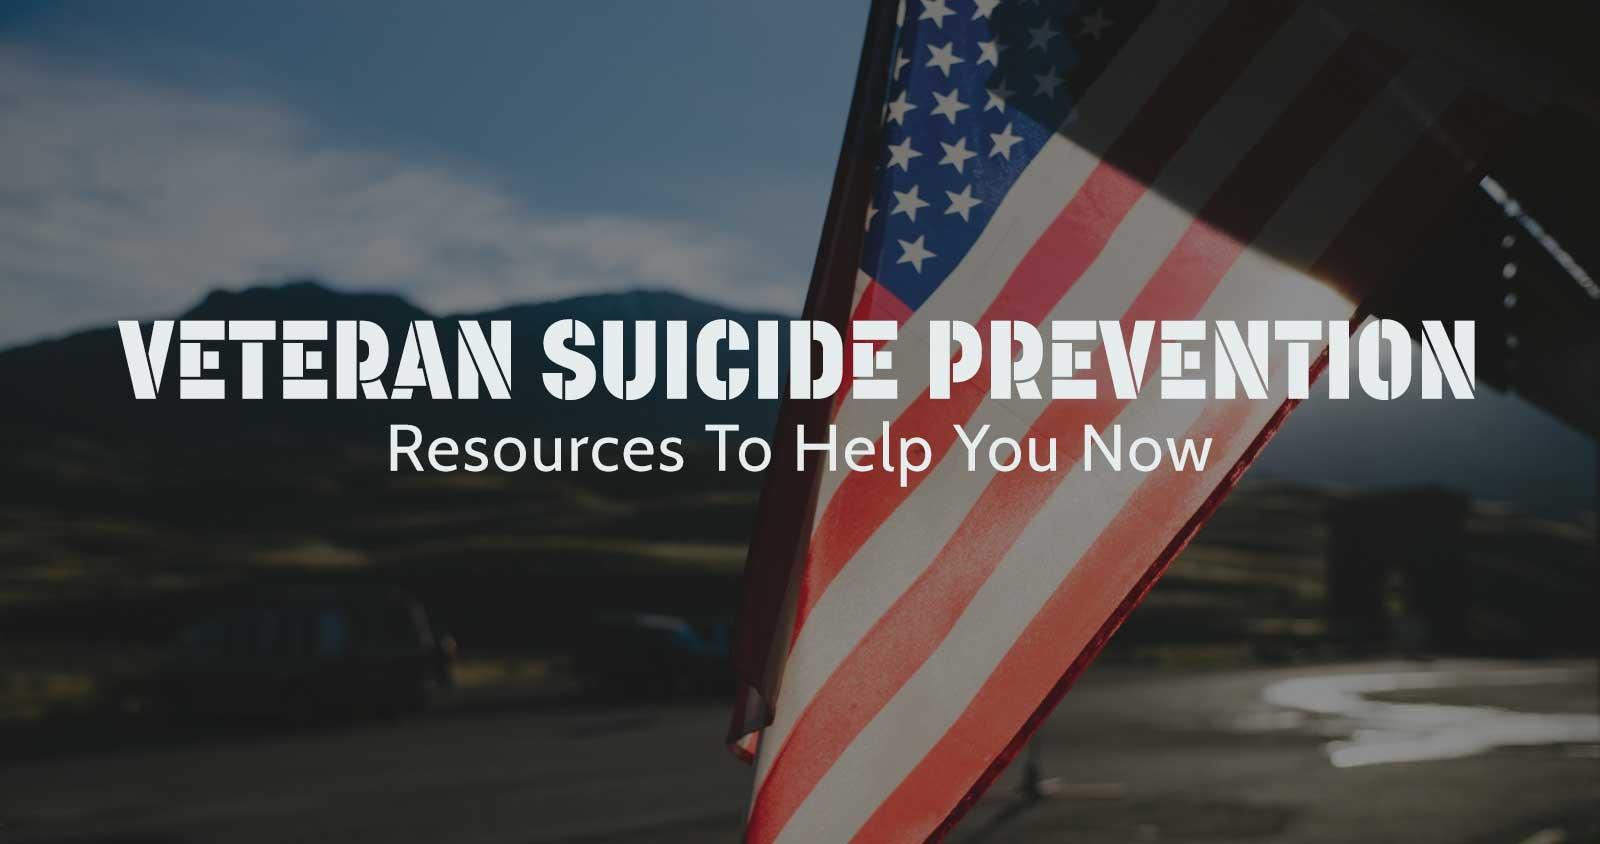 Nebraska Veteran's Suicide / Crisis Hotline